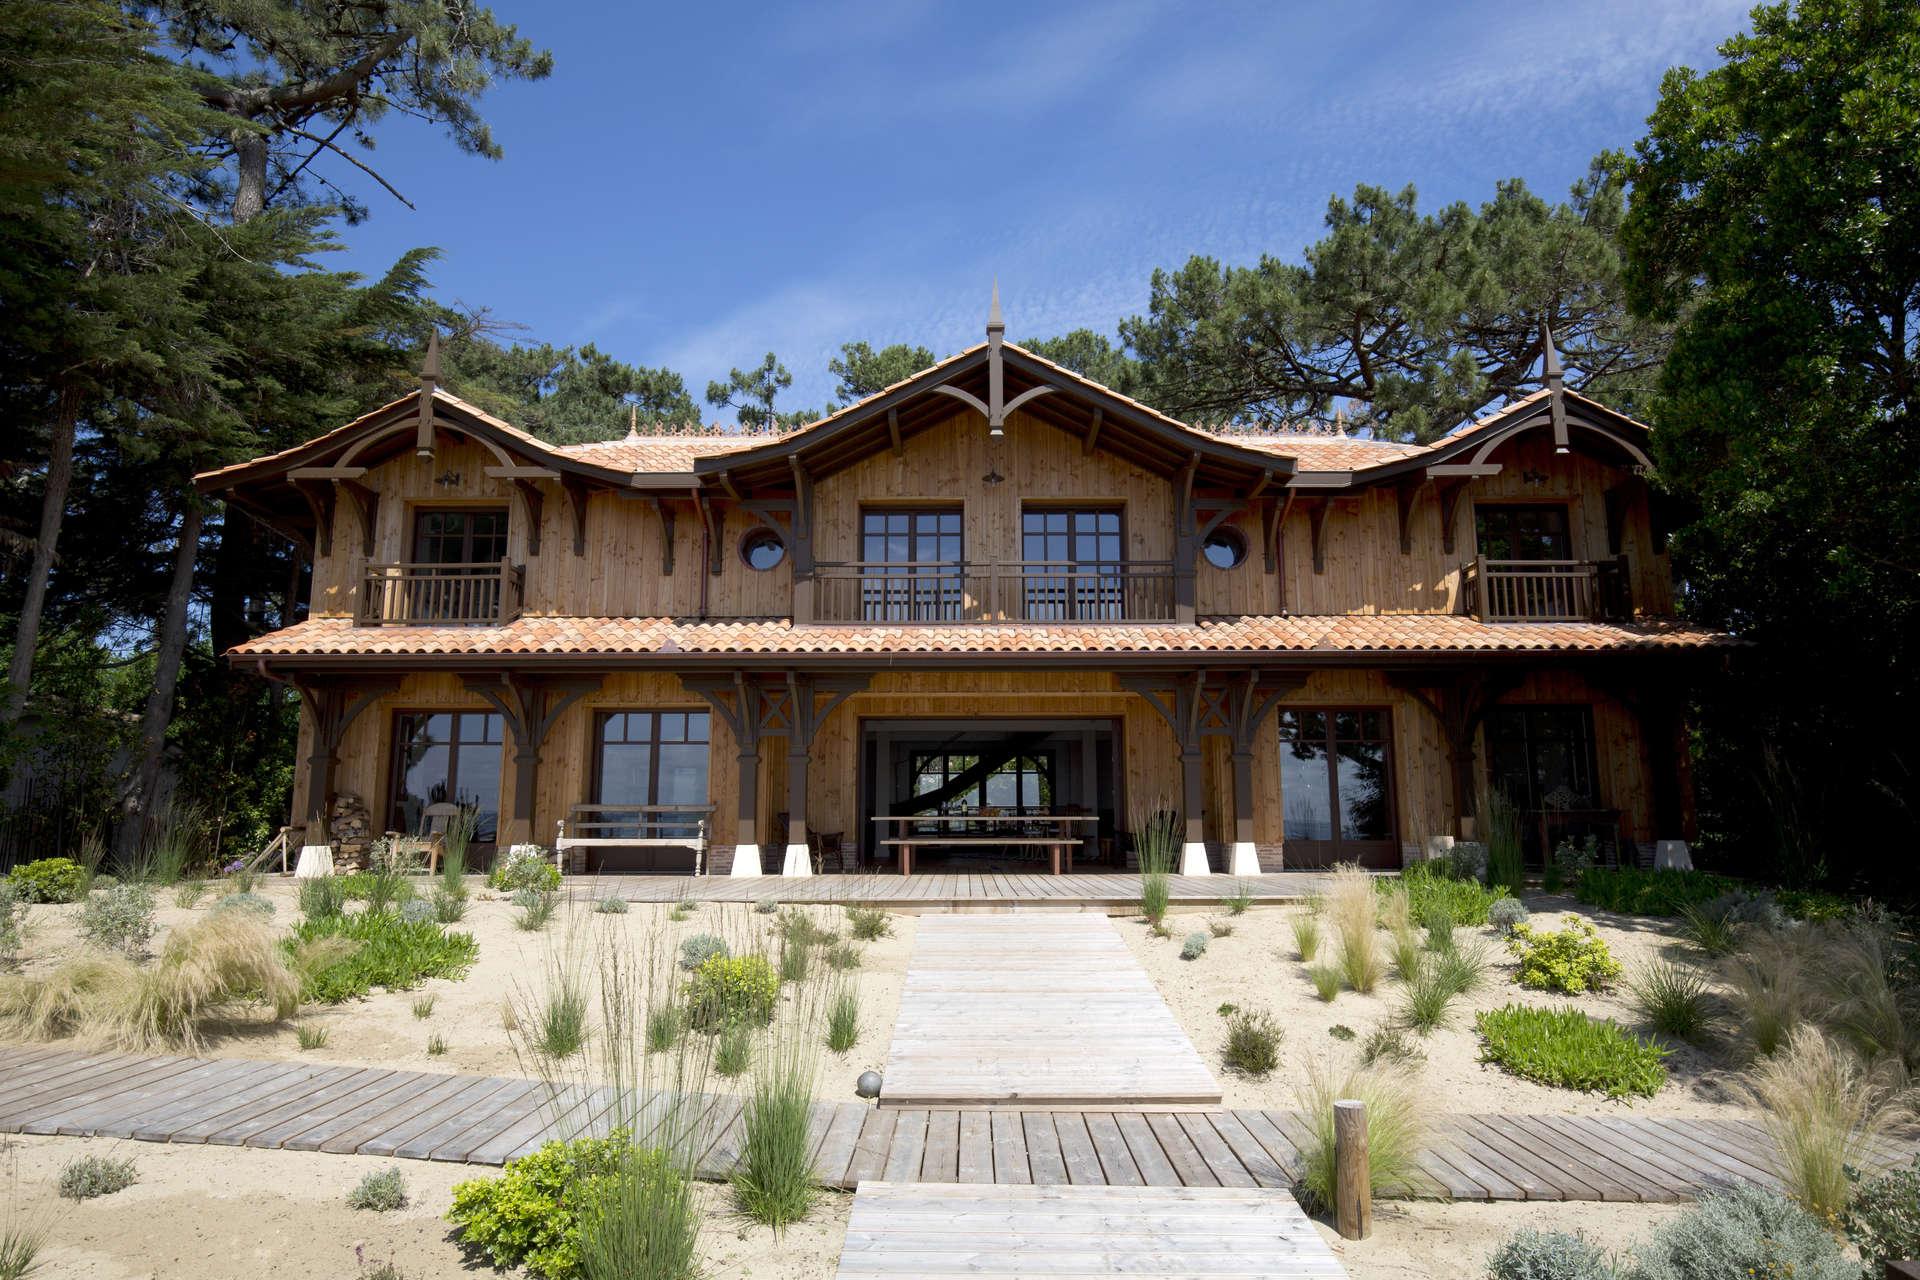 Luxury vacation rentals europe - France - Southwest france - Cap ferret  - Lodge SHL | Cap Ferret - Image 1/14